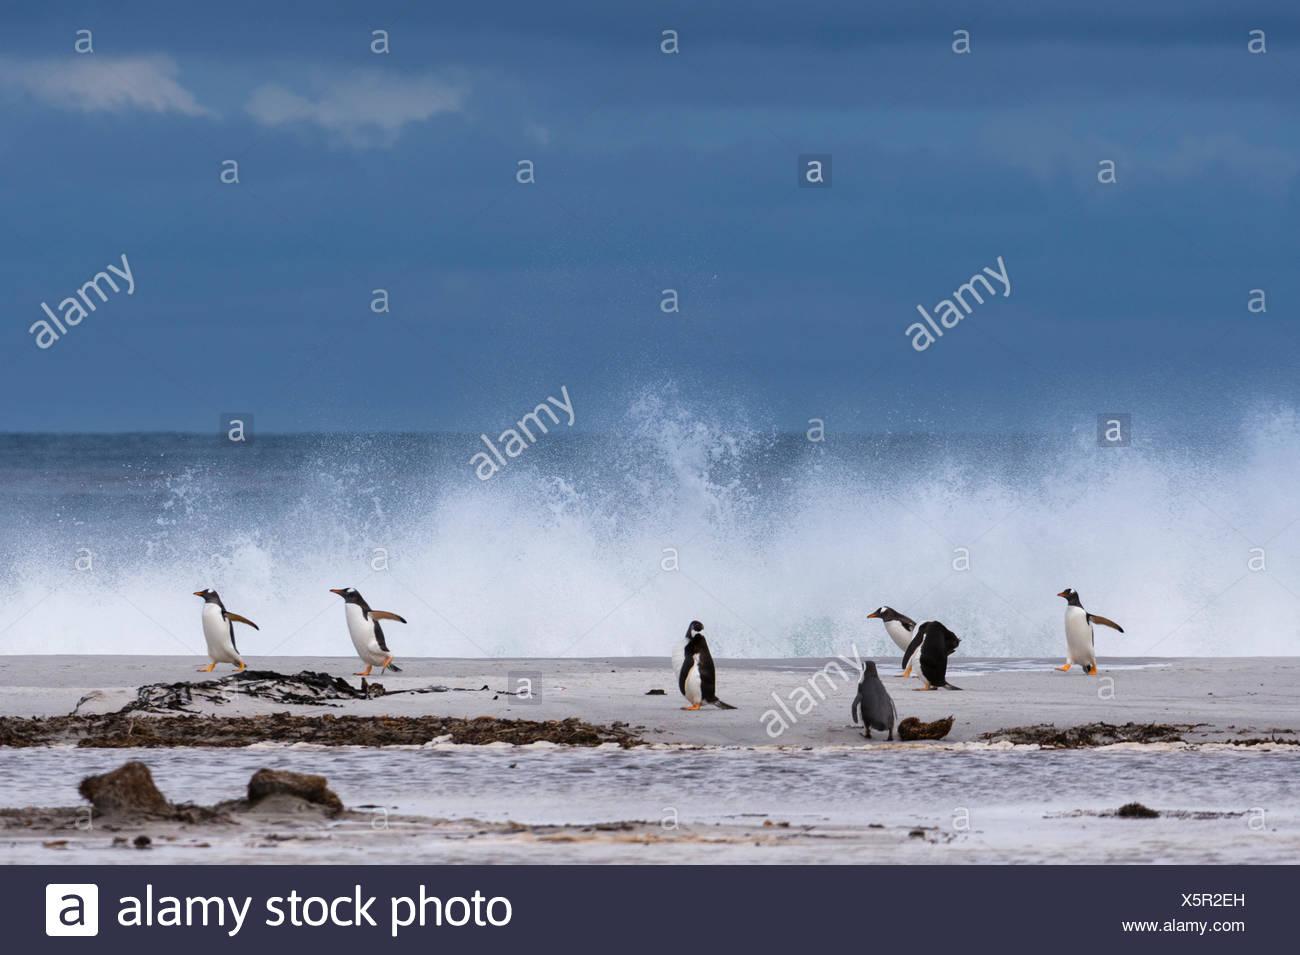 Gentoo penguins, Pygoscelis papua, on a sandy beach. - Stock Image